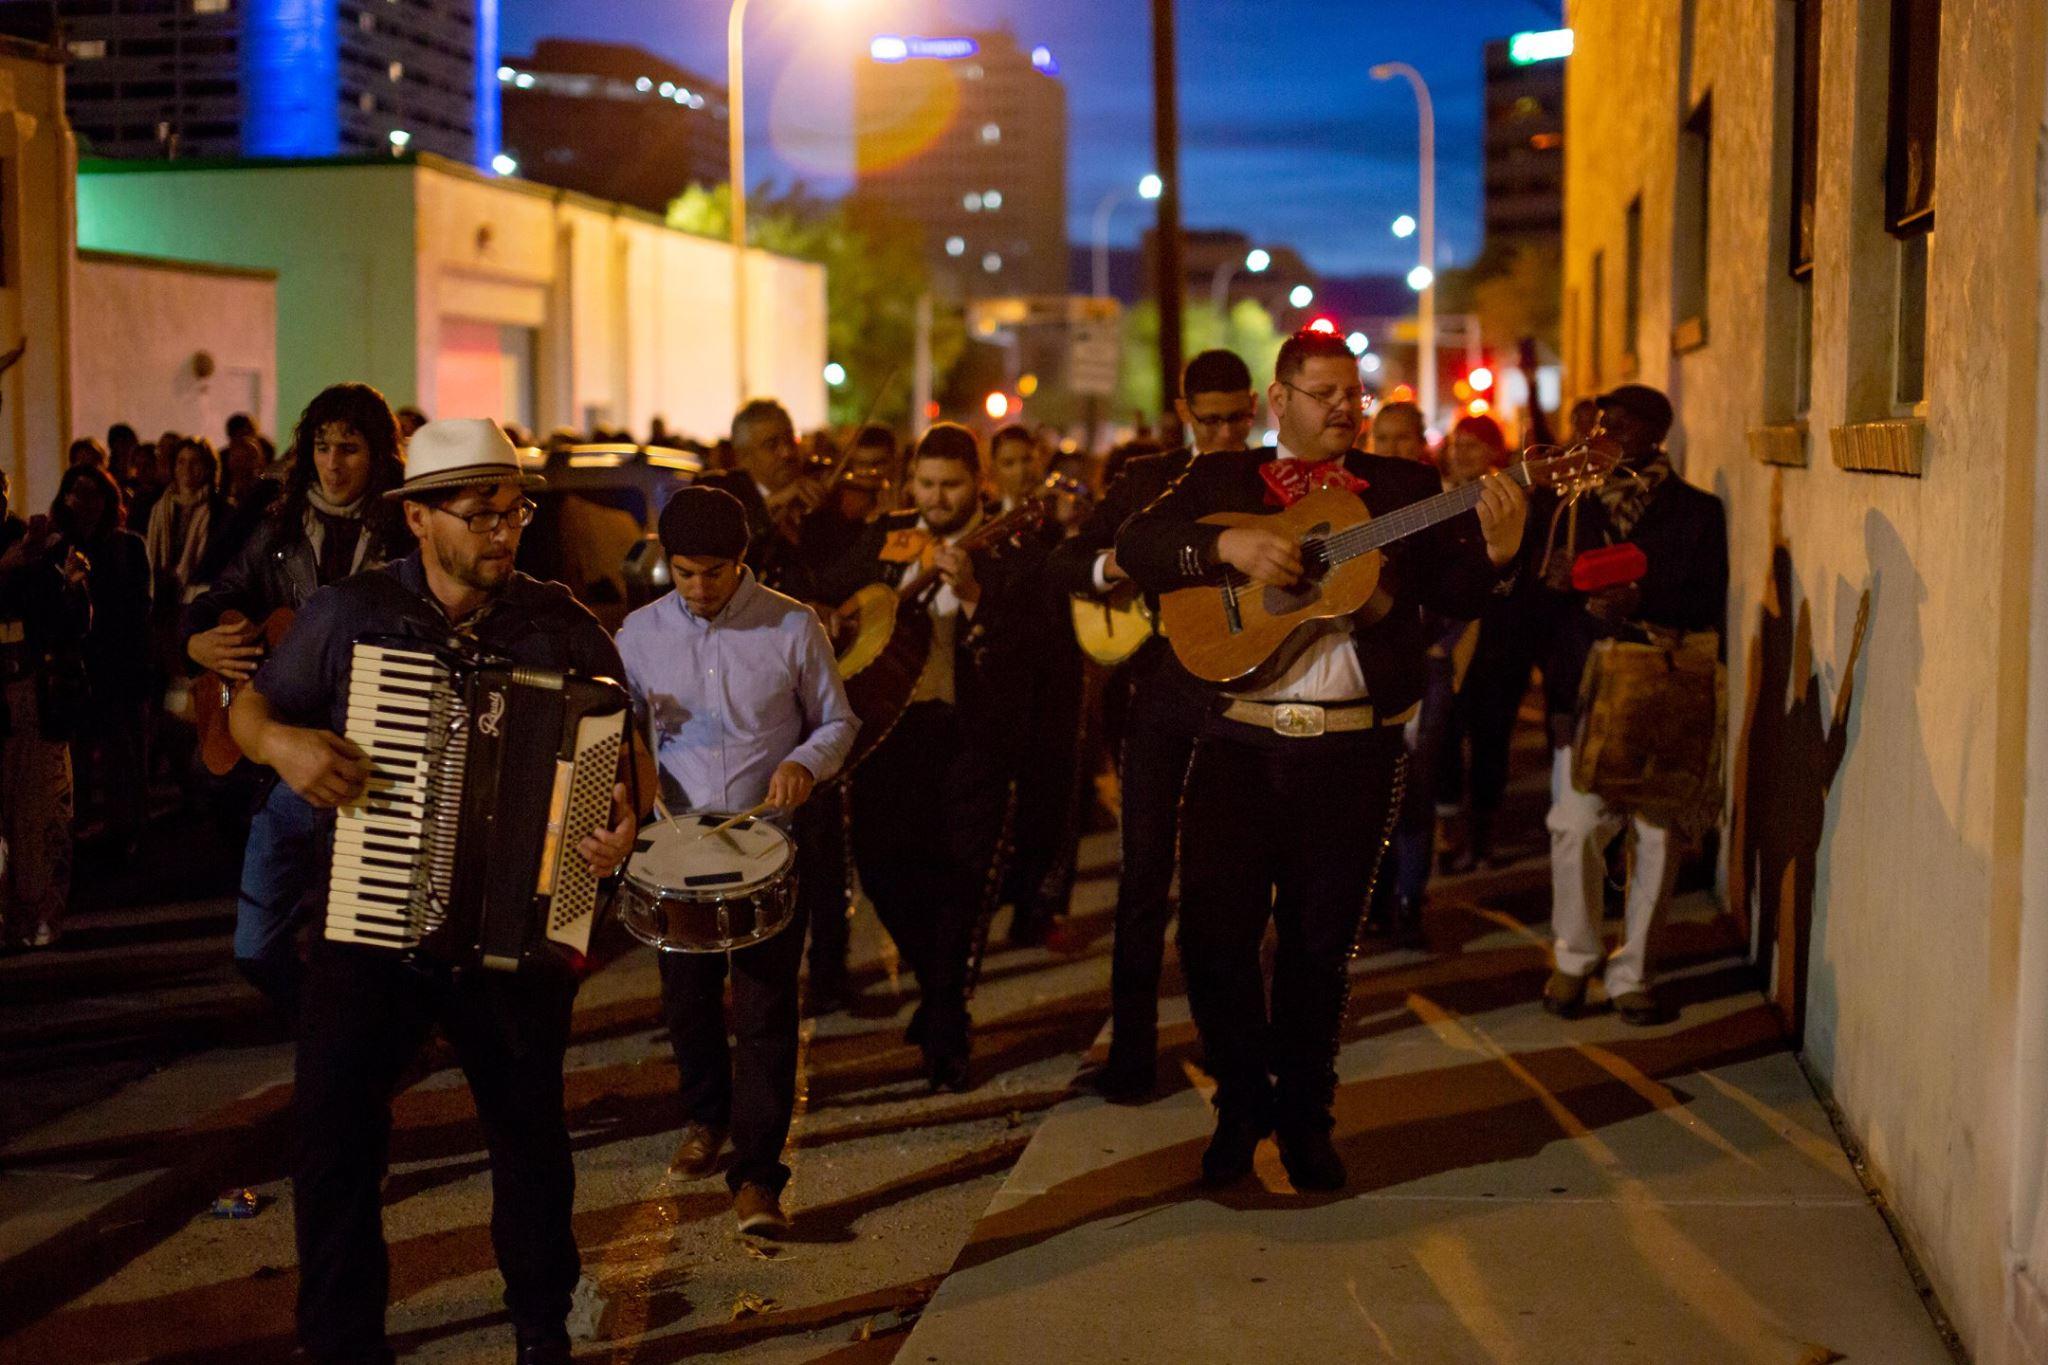 Closing night procession through the streets of Albuquerque.